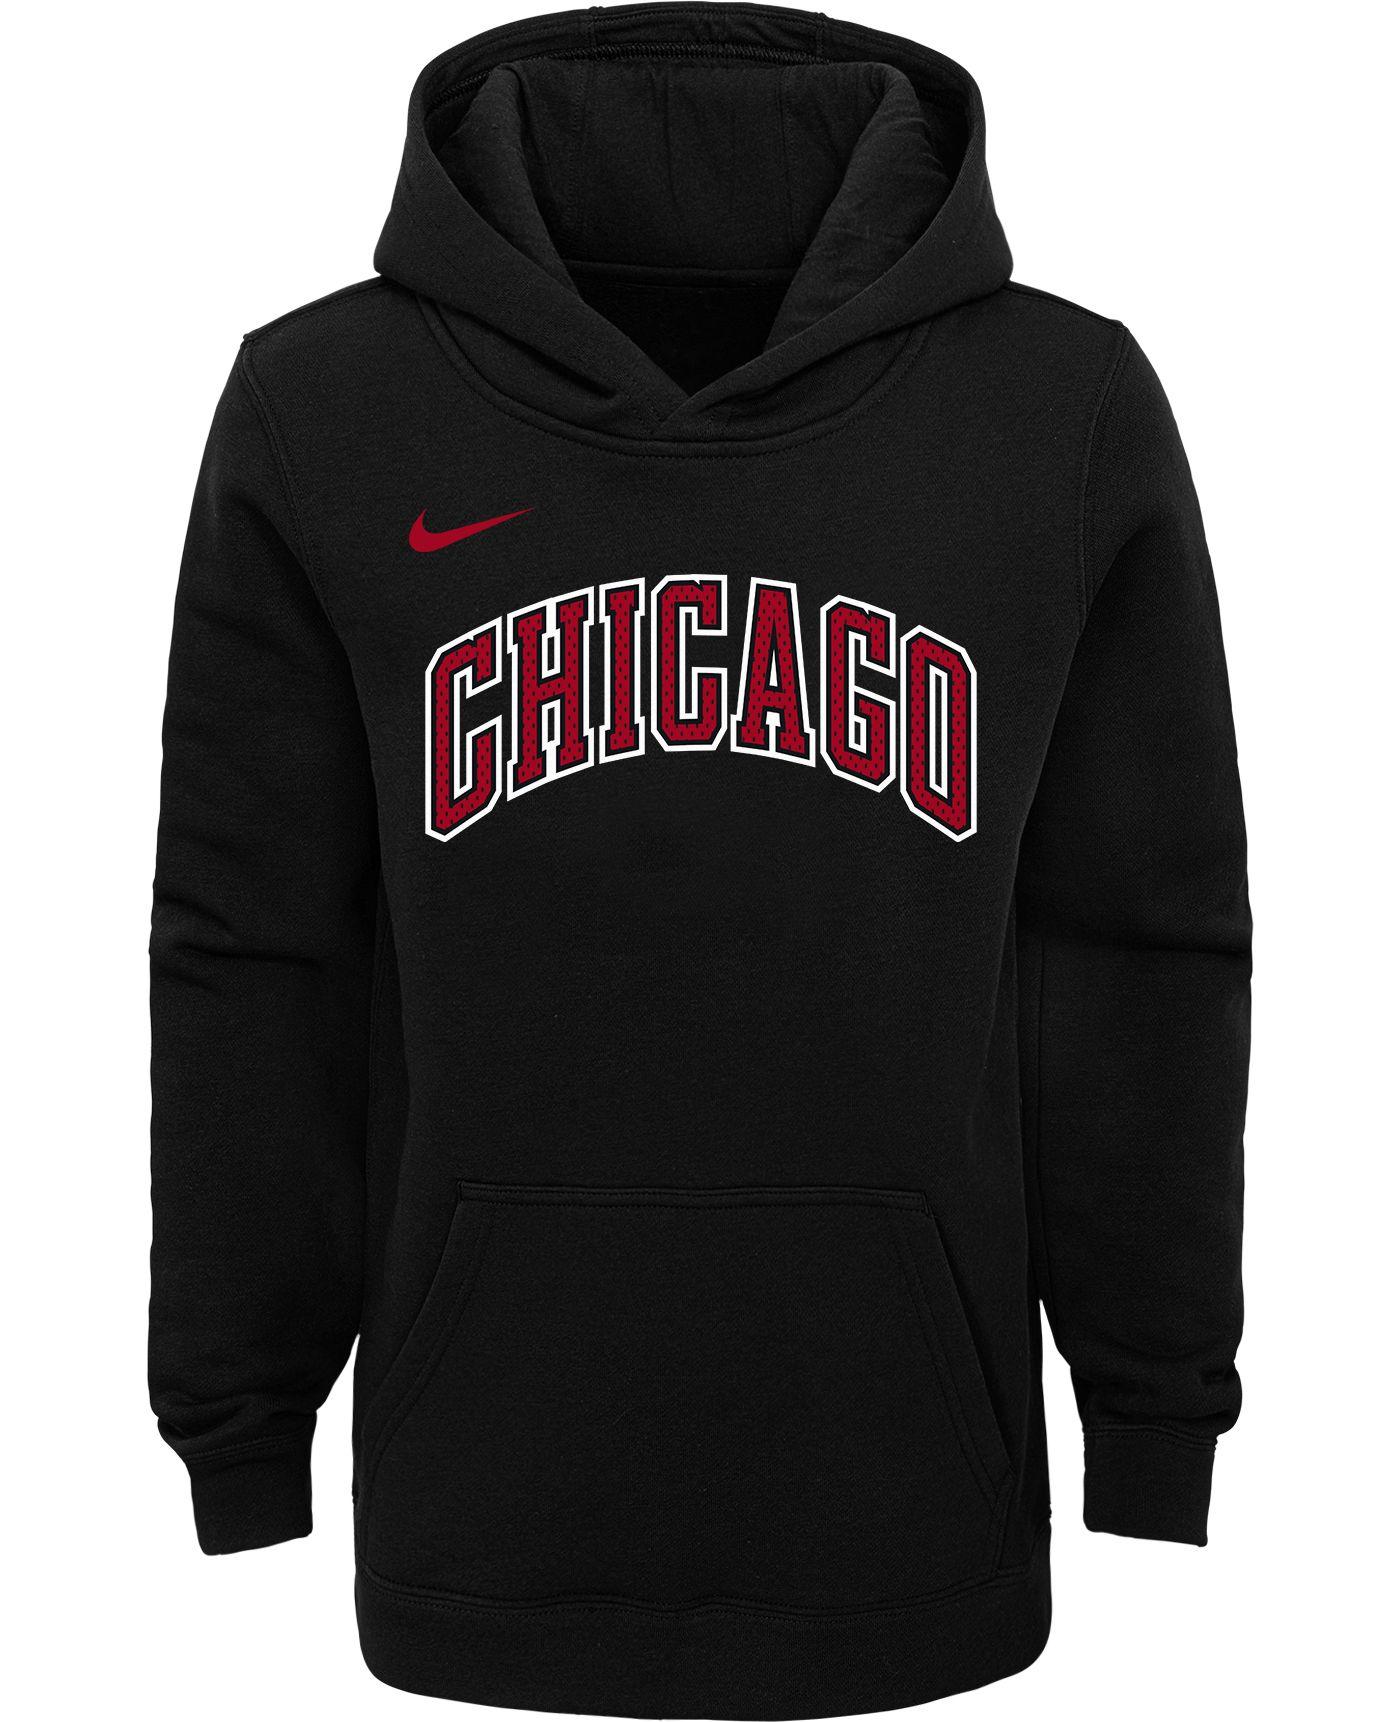 Nike Youth Chicago Bulls Black Statement Hoodie